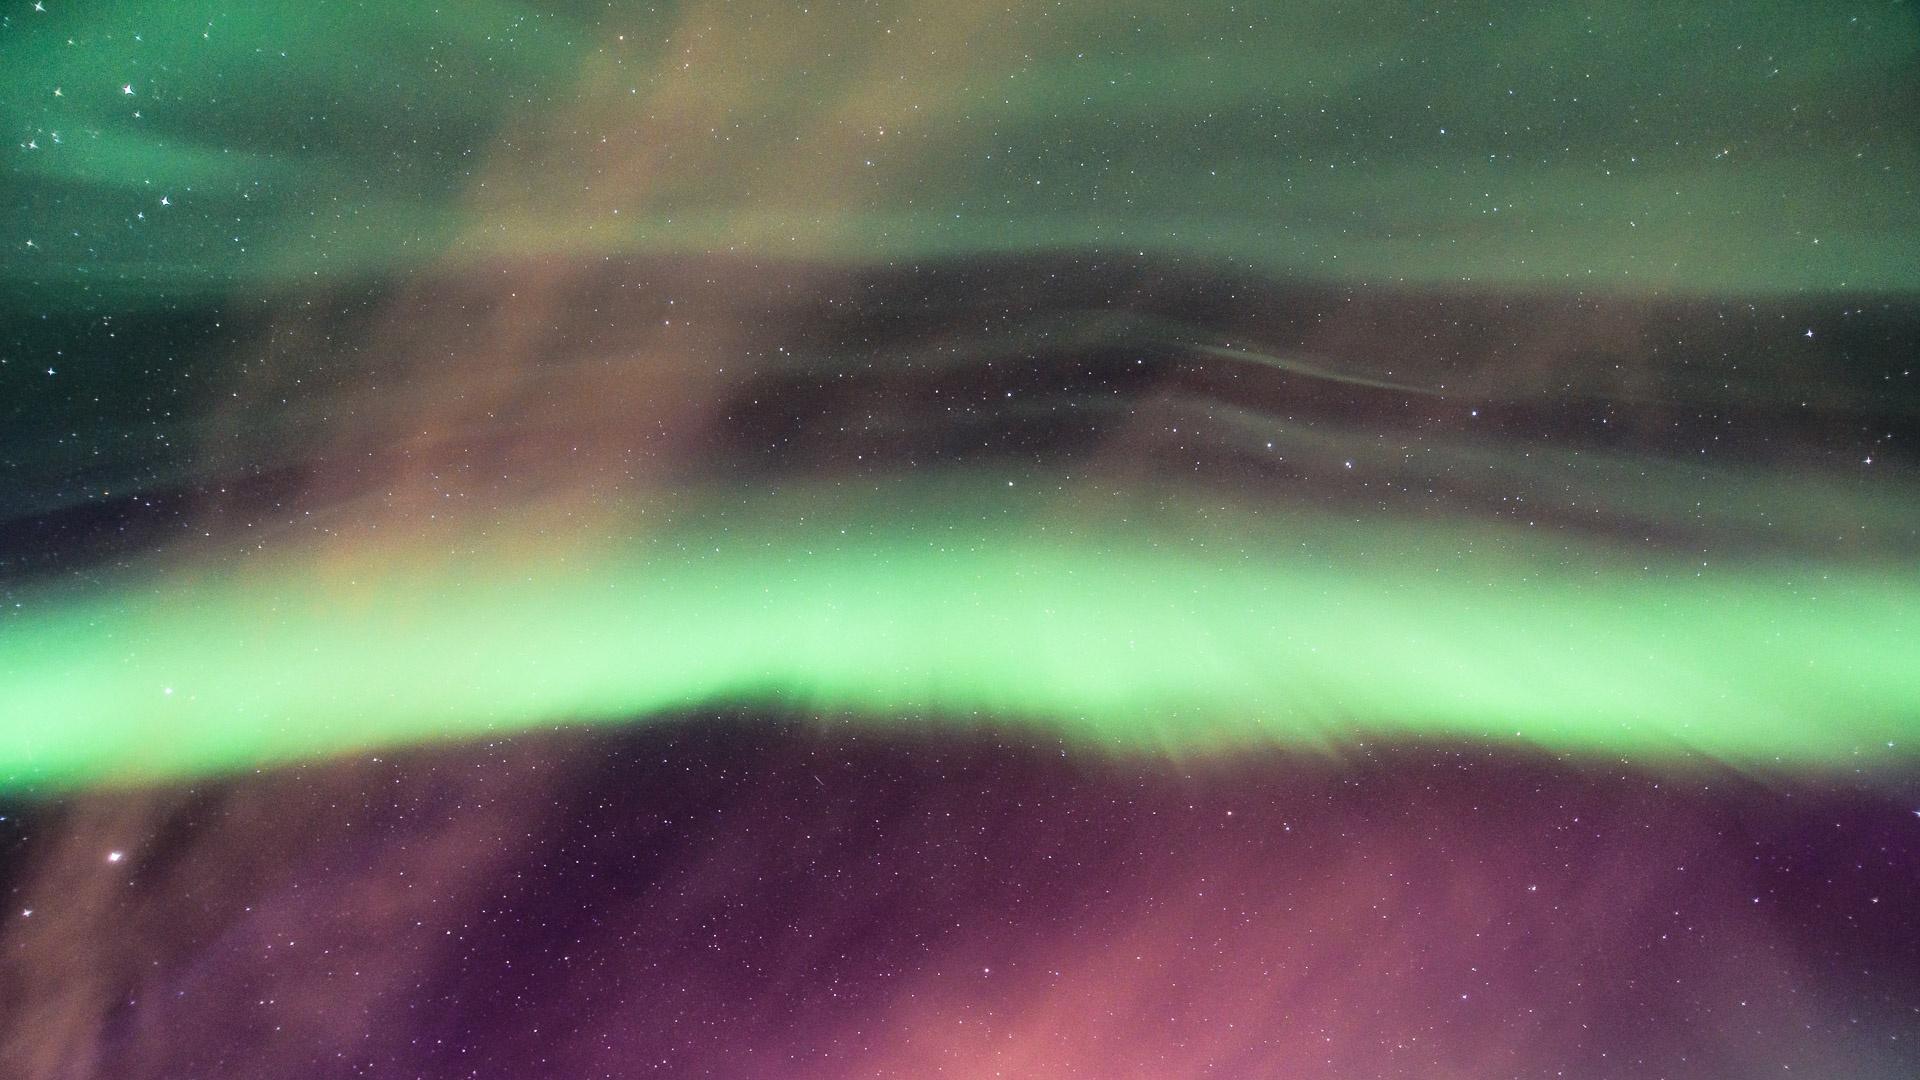 Aurora Borealis and Red Clouds by Veijo Härkönen